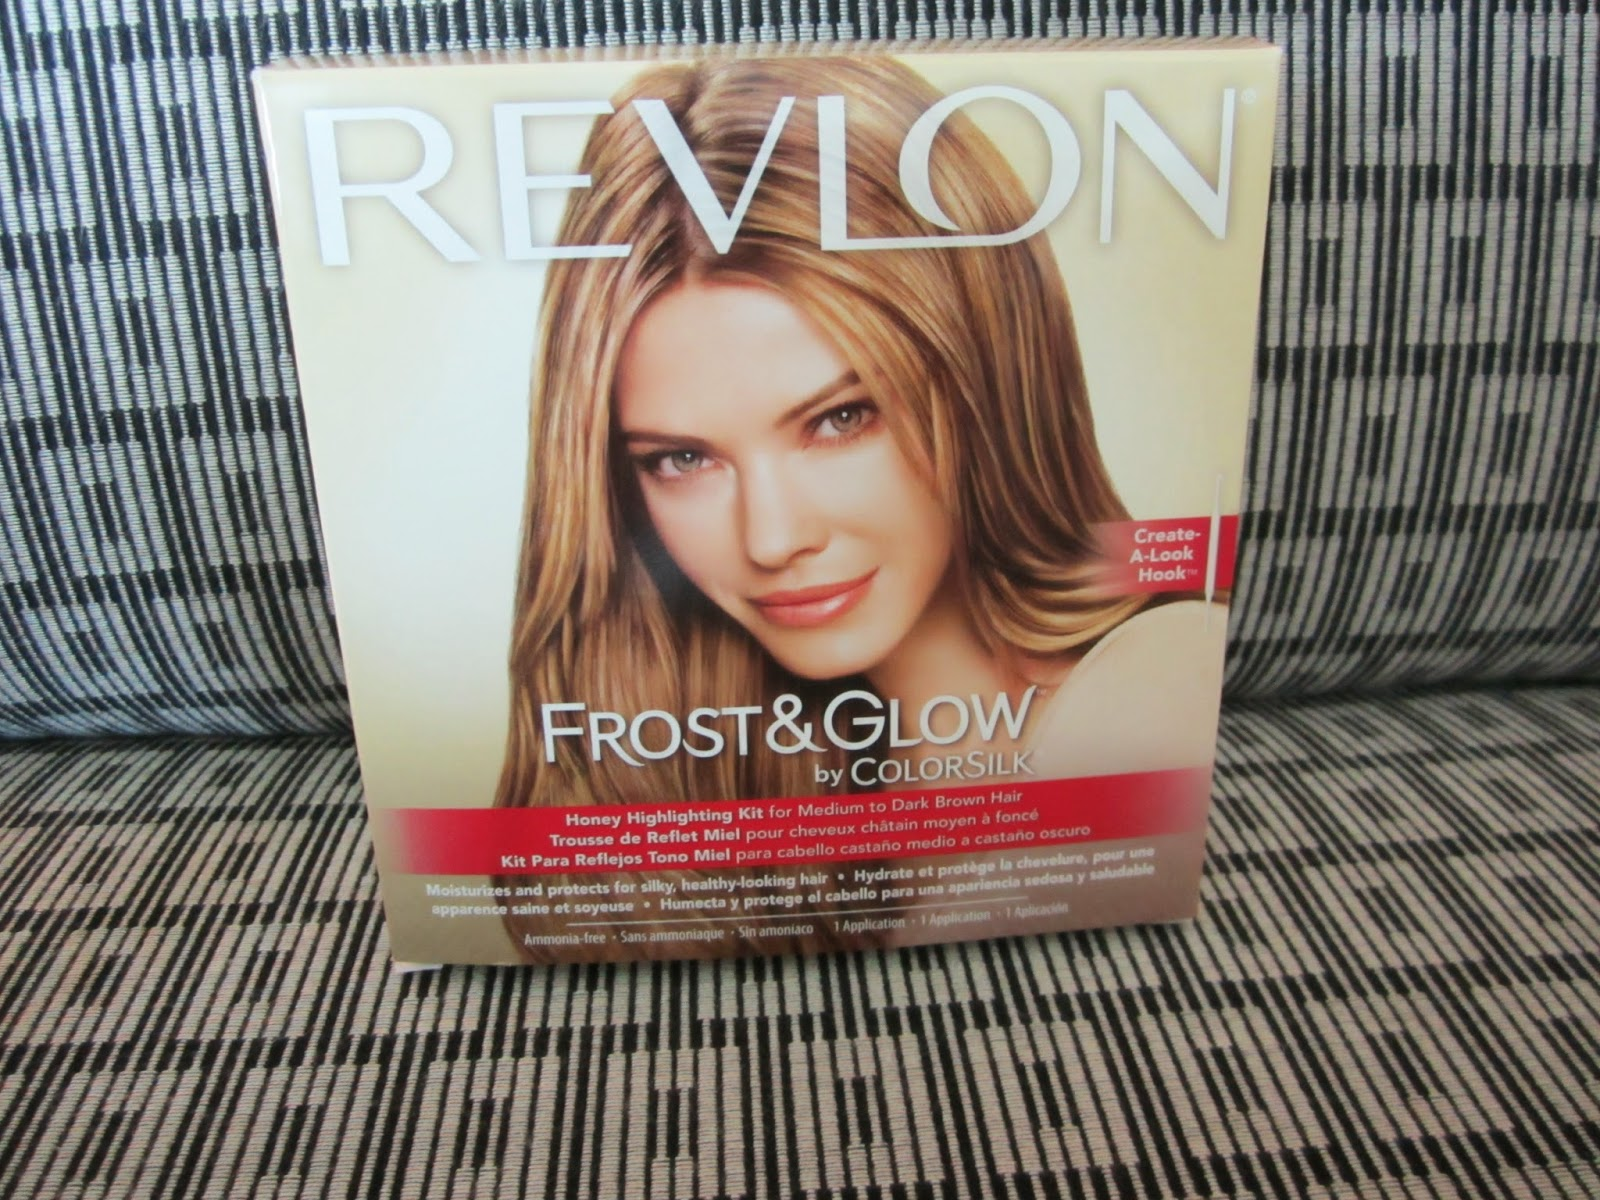 Revlon Frost Glow Honey Highlighting Kit Review On My Black Hair